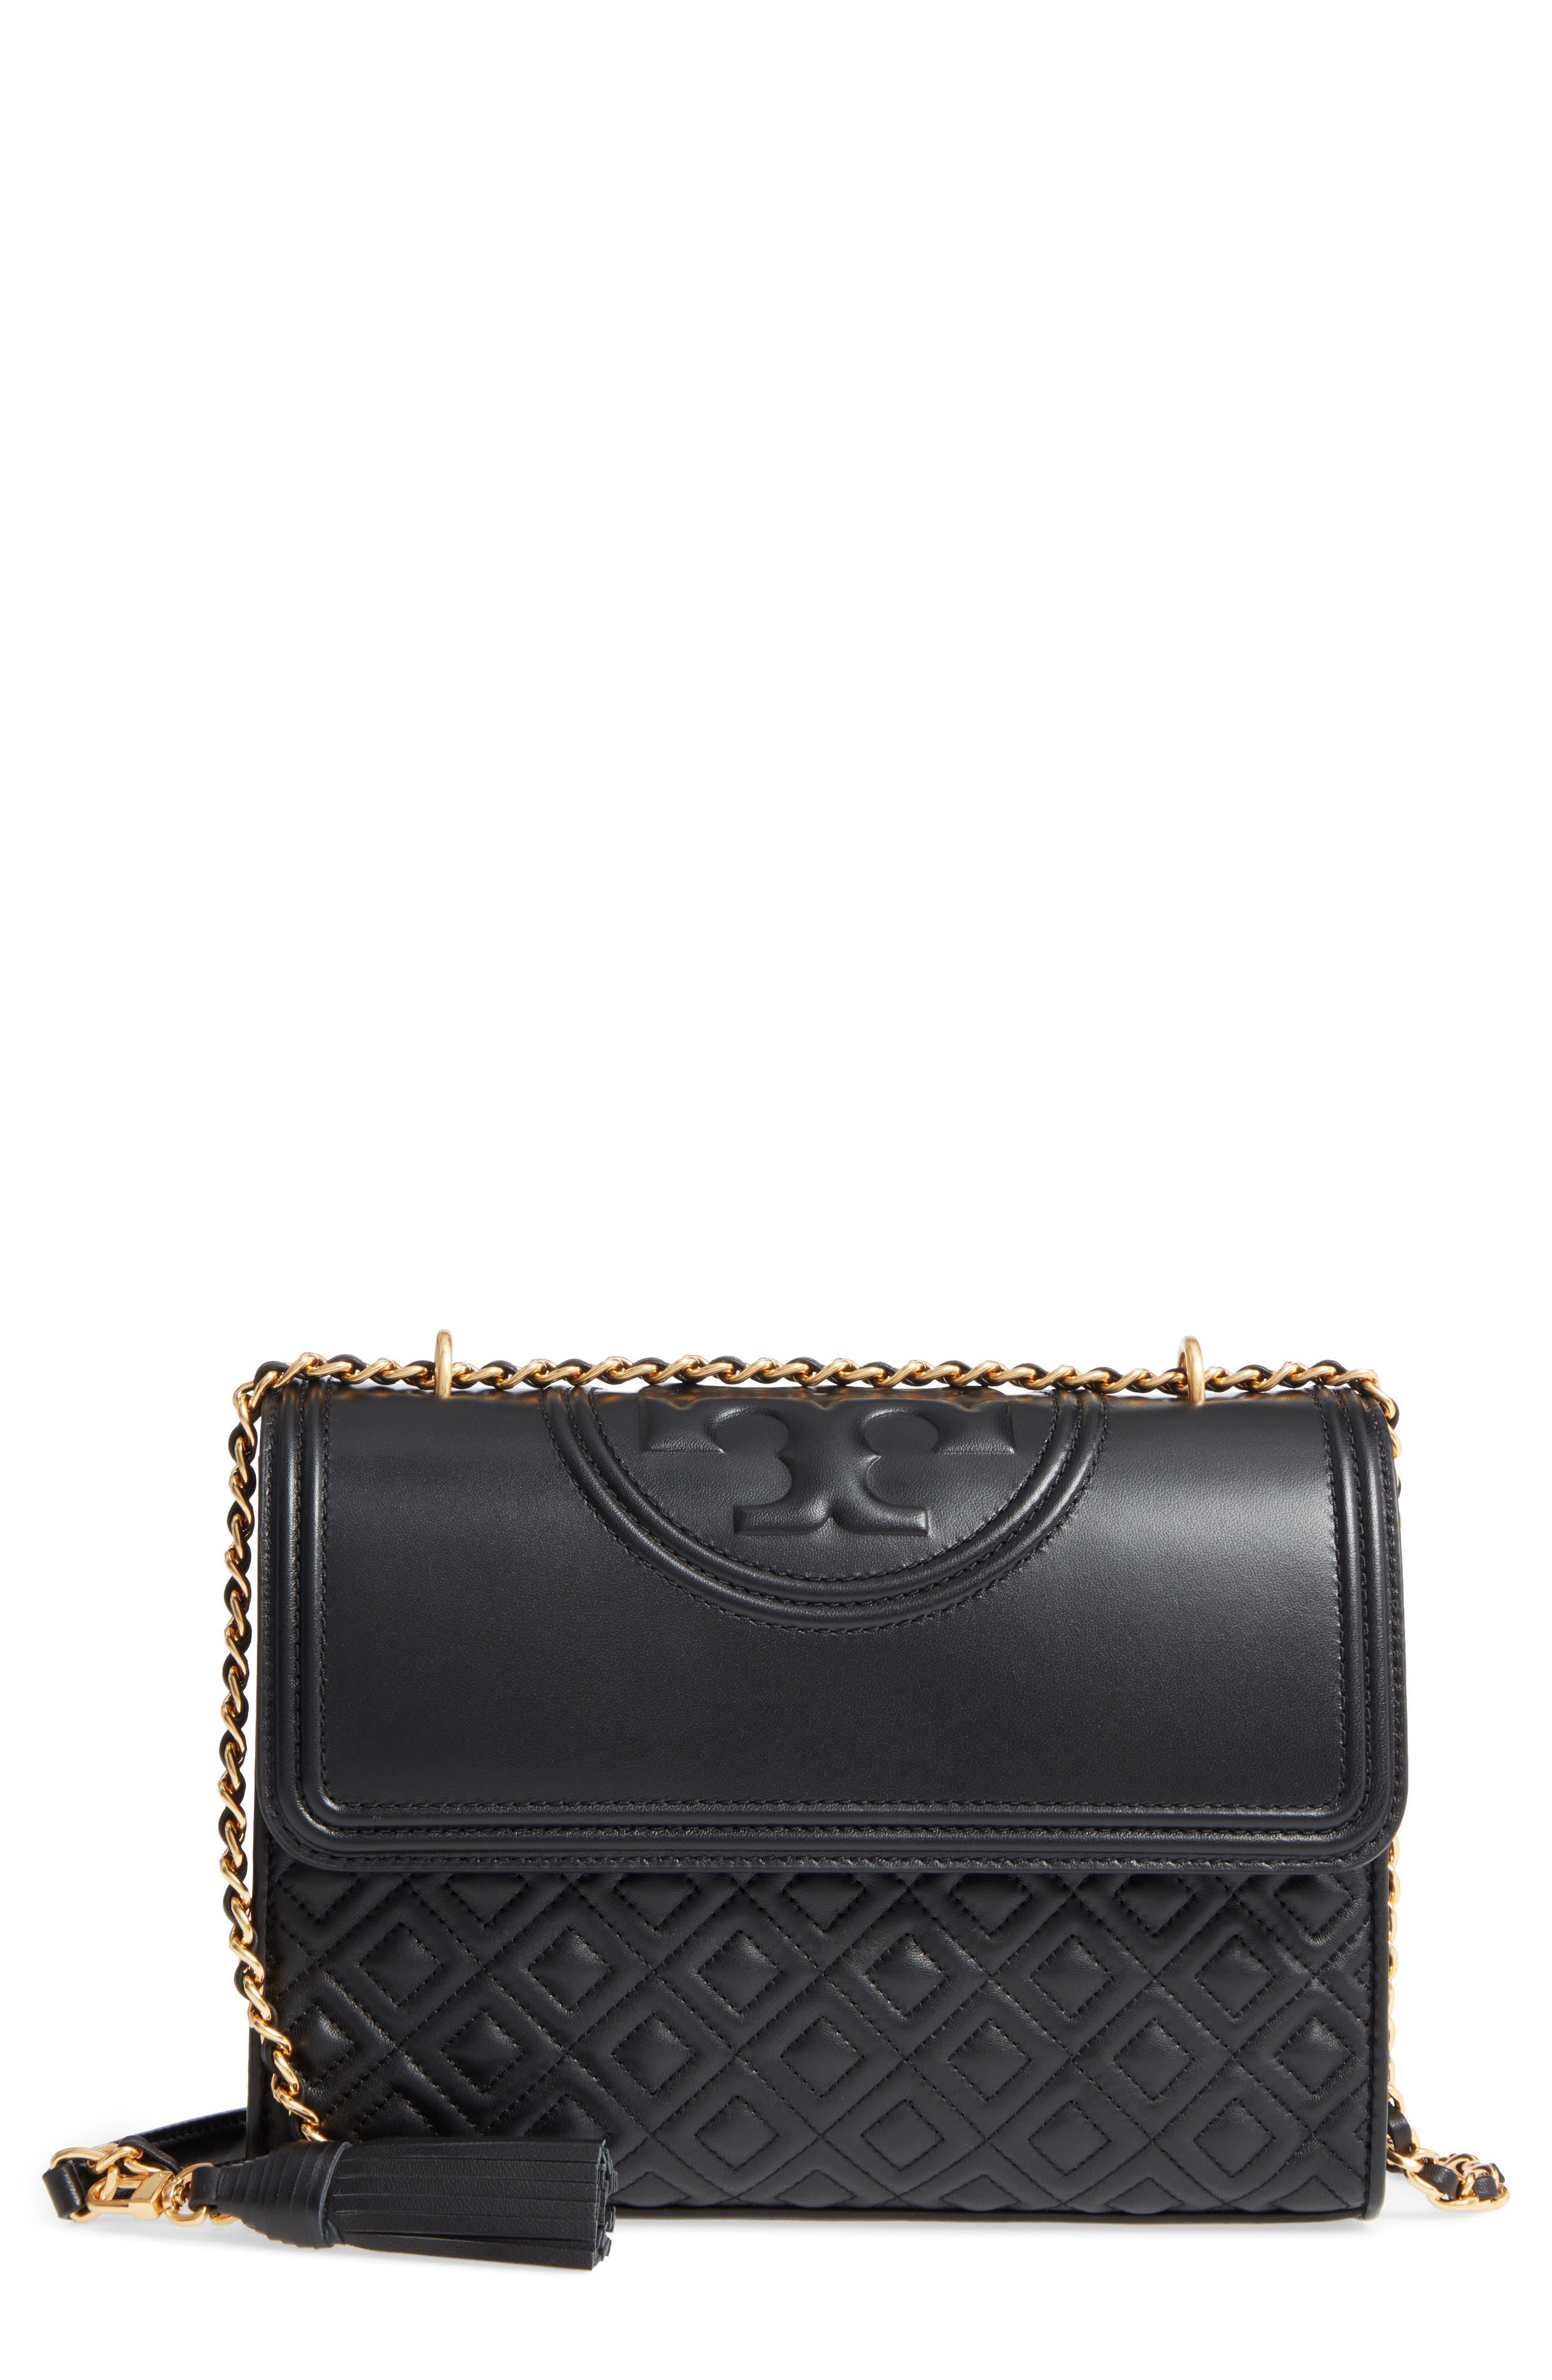 TORY BURCH, Fleming Leather Convertible Shoulder Bag, Main thumbnail 1, color, BLACK